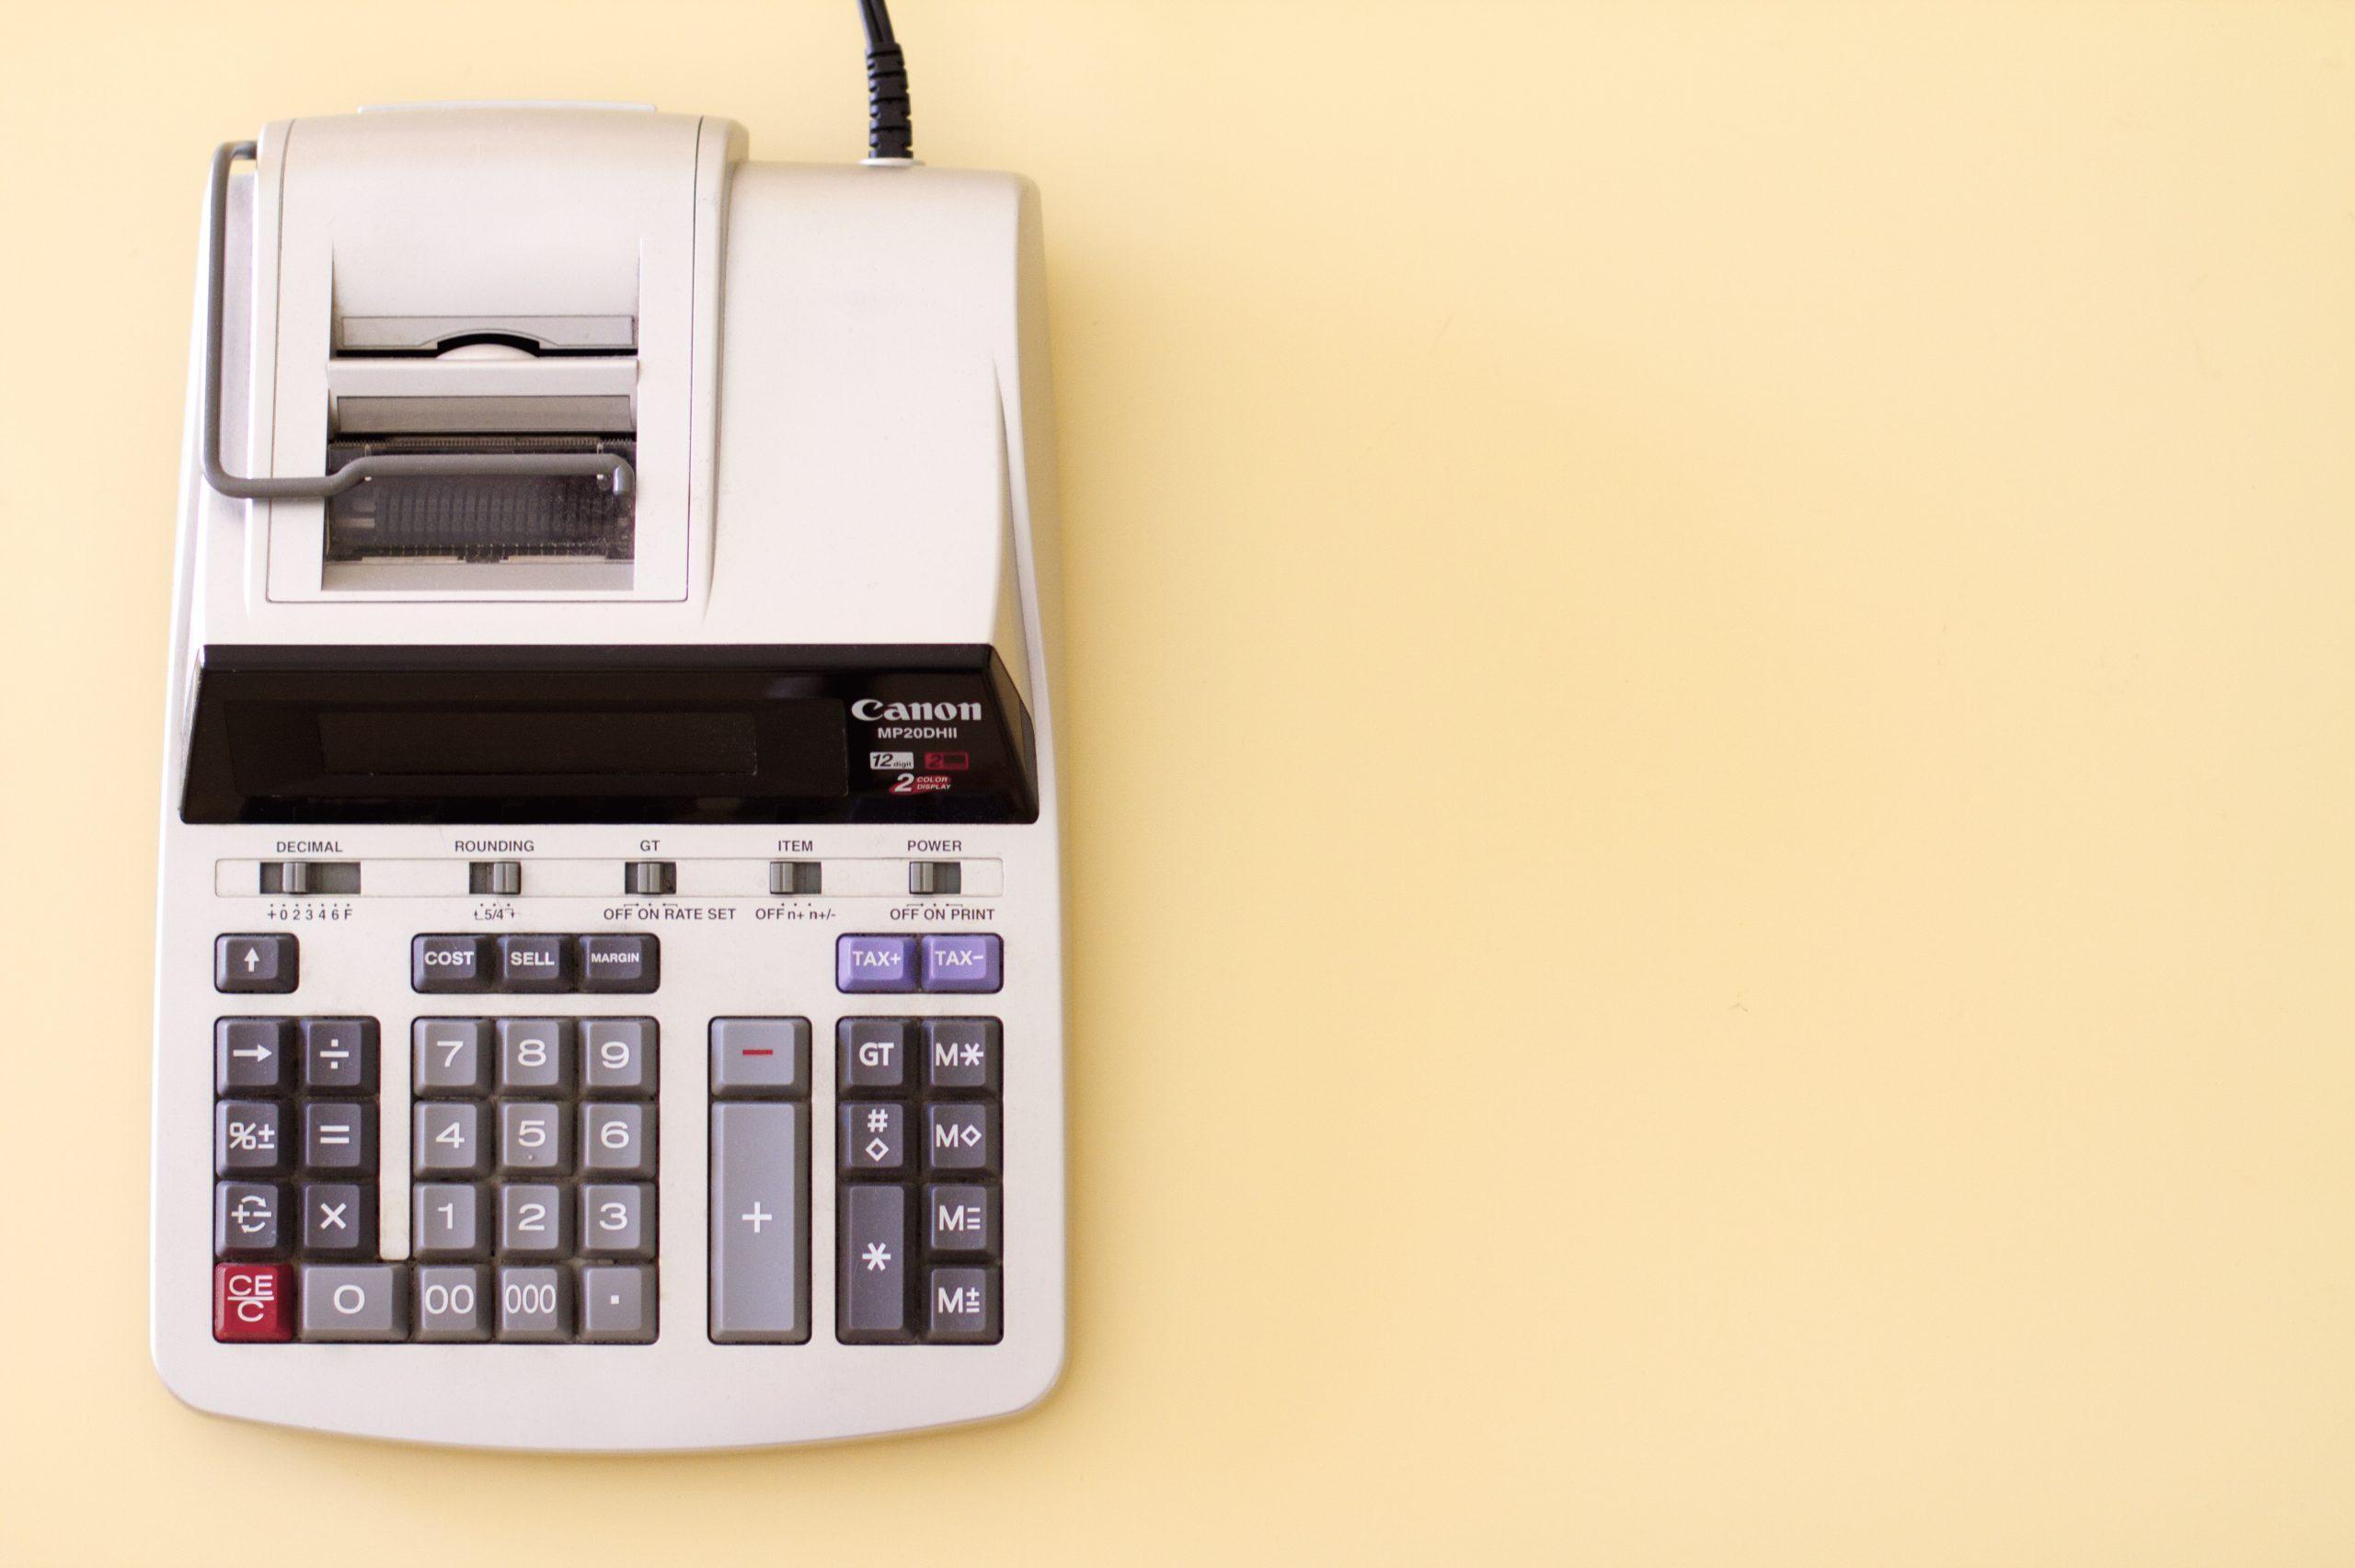 Spanish mortgage calculator